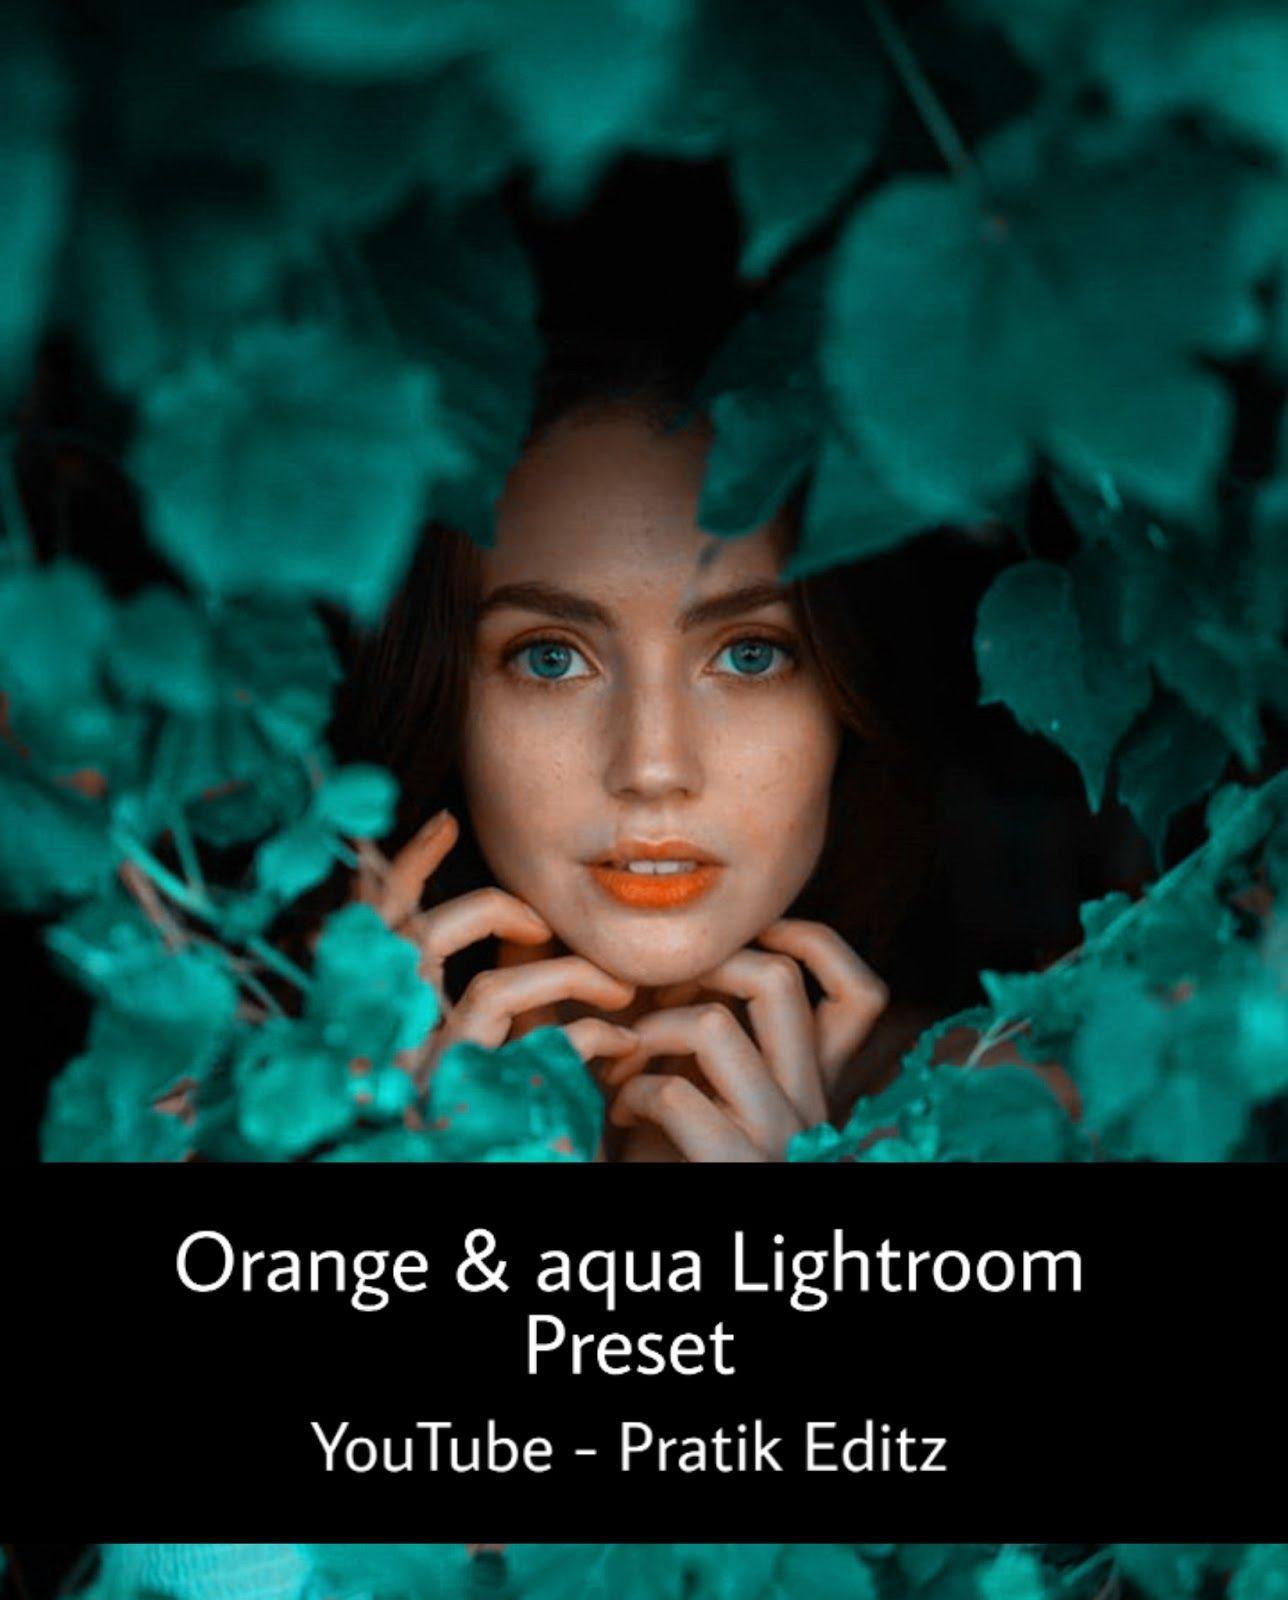 Aqua And Orange Lightroom Preset.dng/file